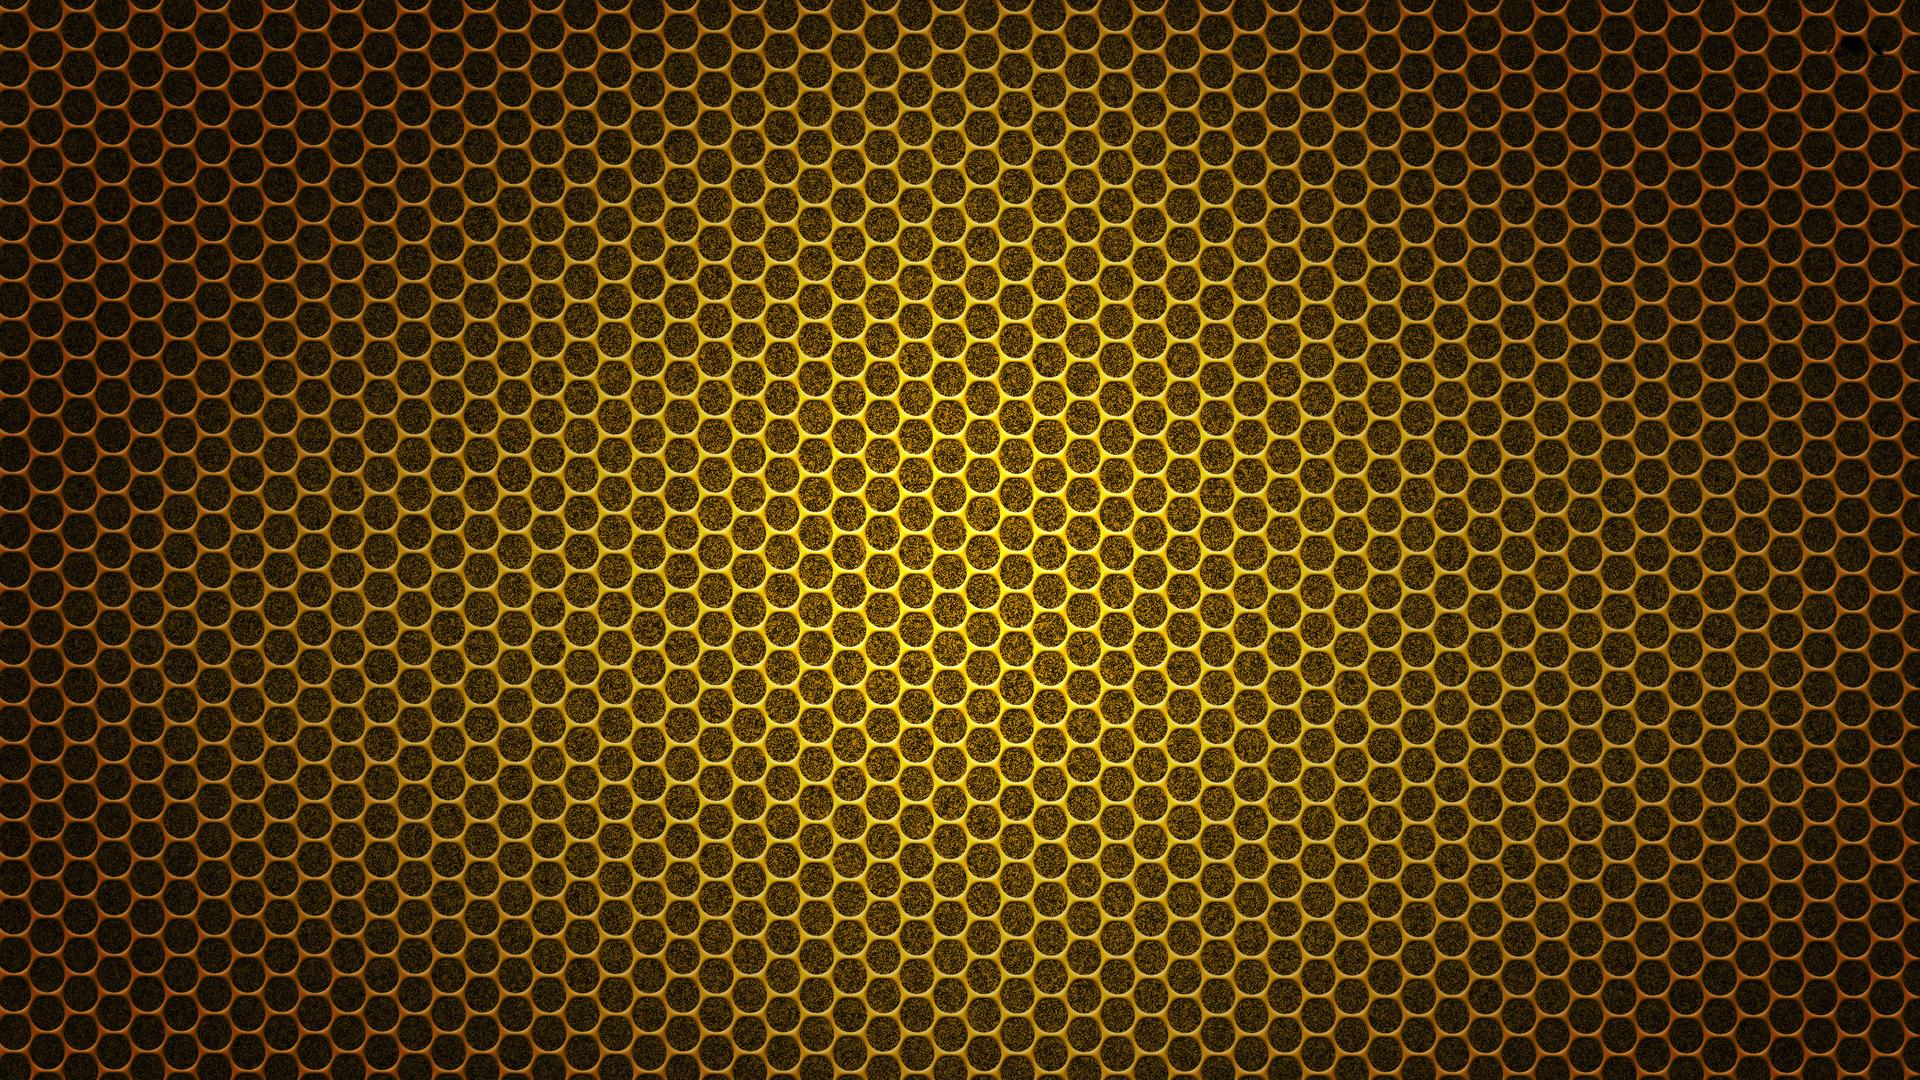 Wallpaper Man Utd Hd Wallpapers Hd Gold Simplexpict1st Org